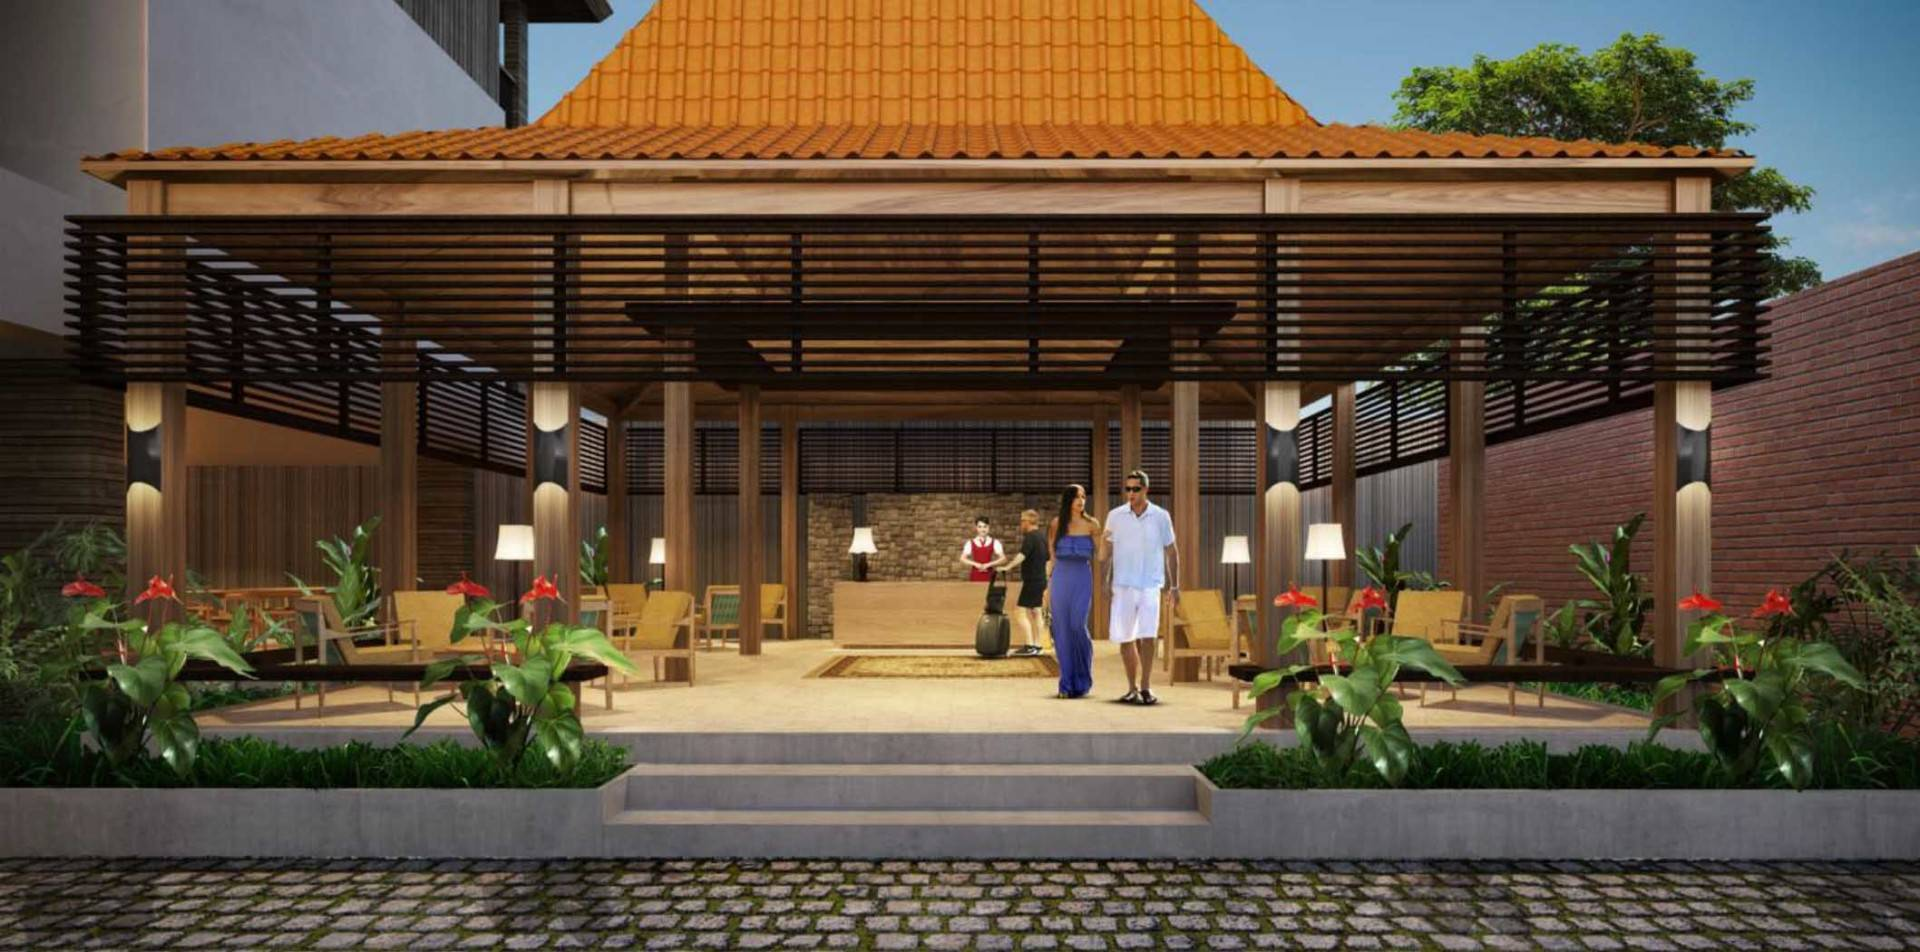 Atelier Prapanca Service Apartment Yogyakarta, Indonesia Yogyakarta, Indonesia Lobby-And-Receptionist-Area Minimalis  7595